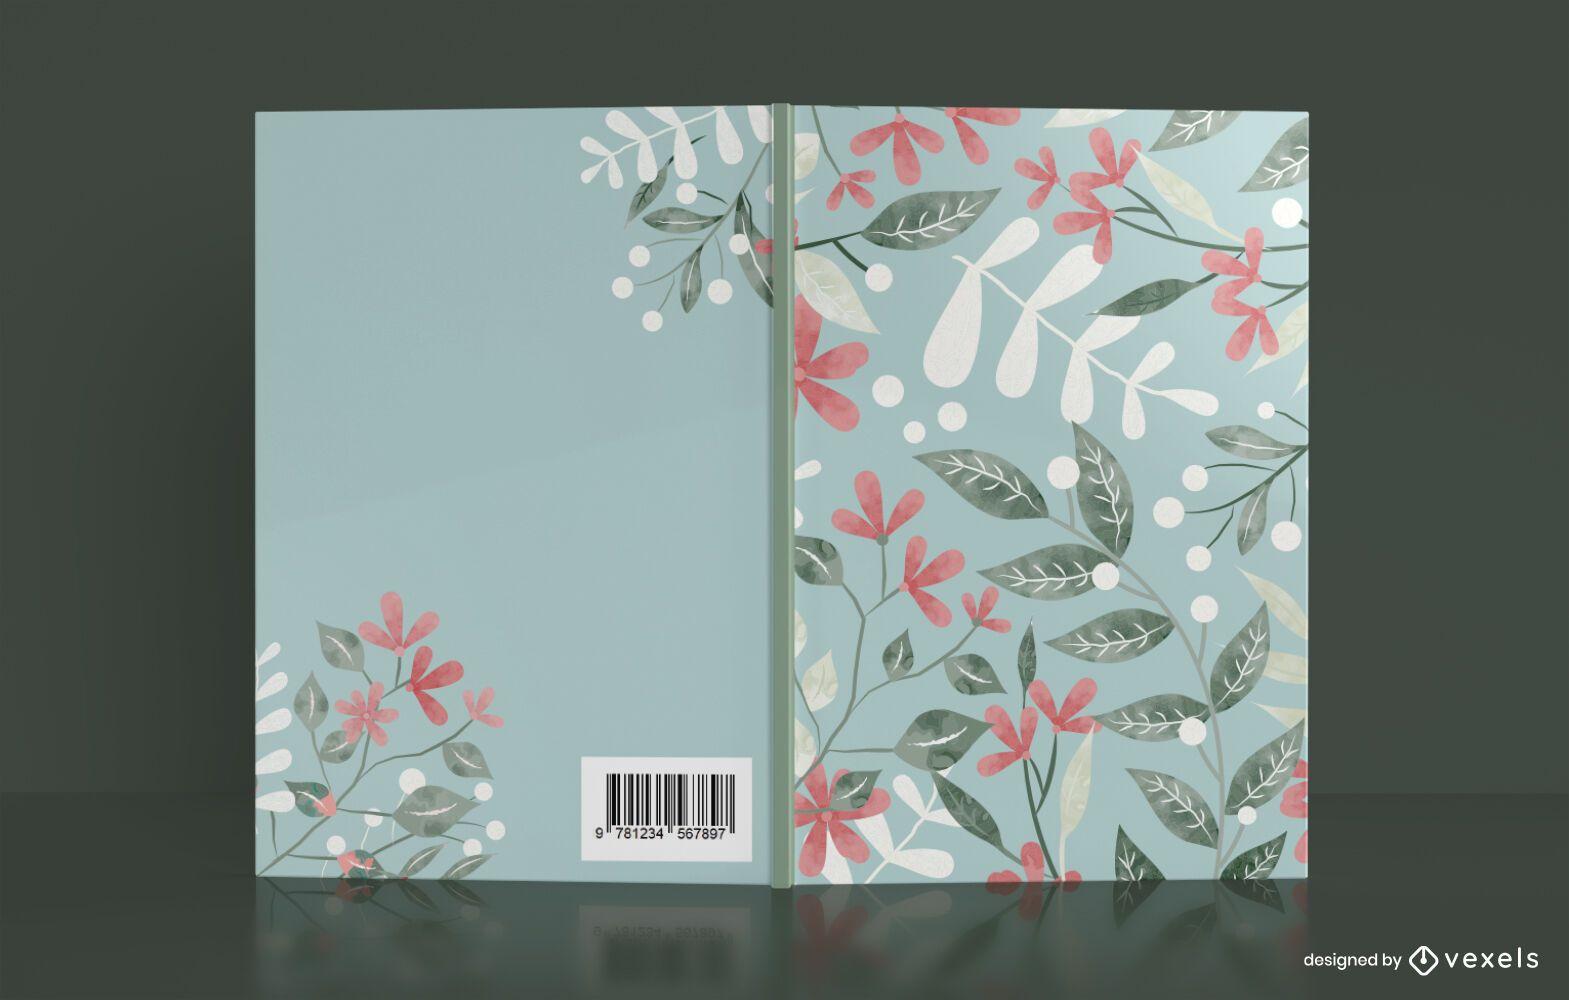 Artistic Floral Book Cover Design